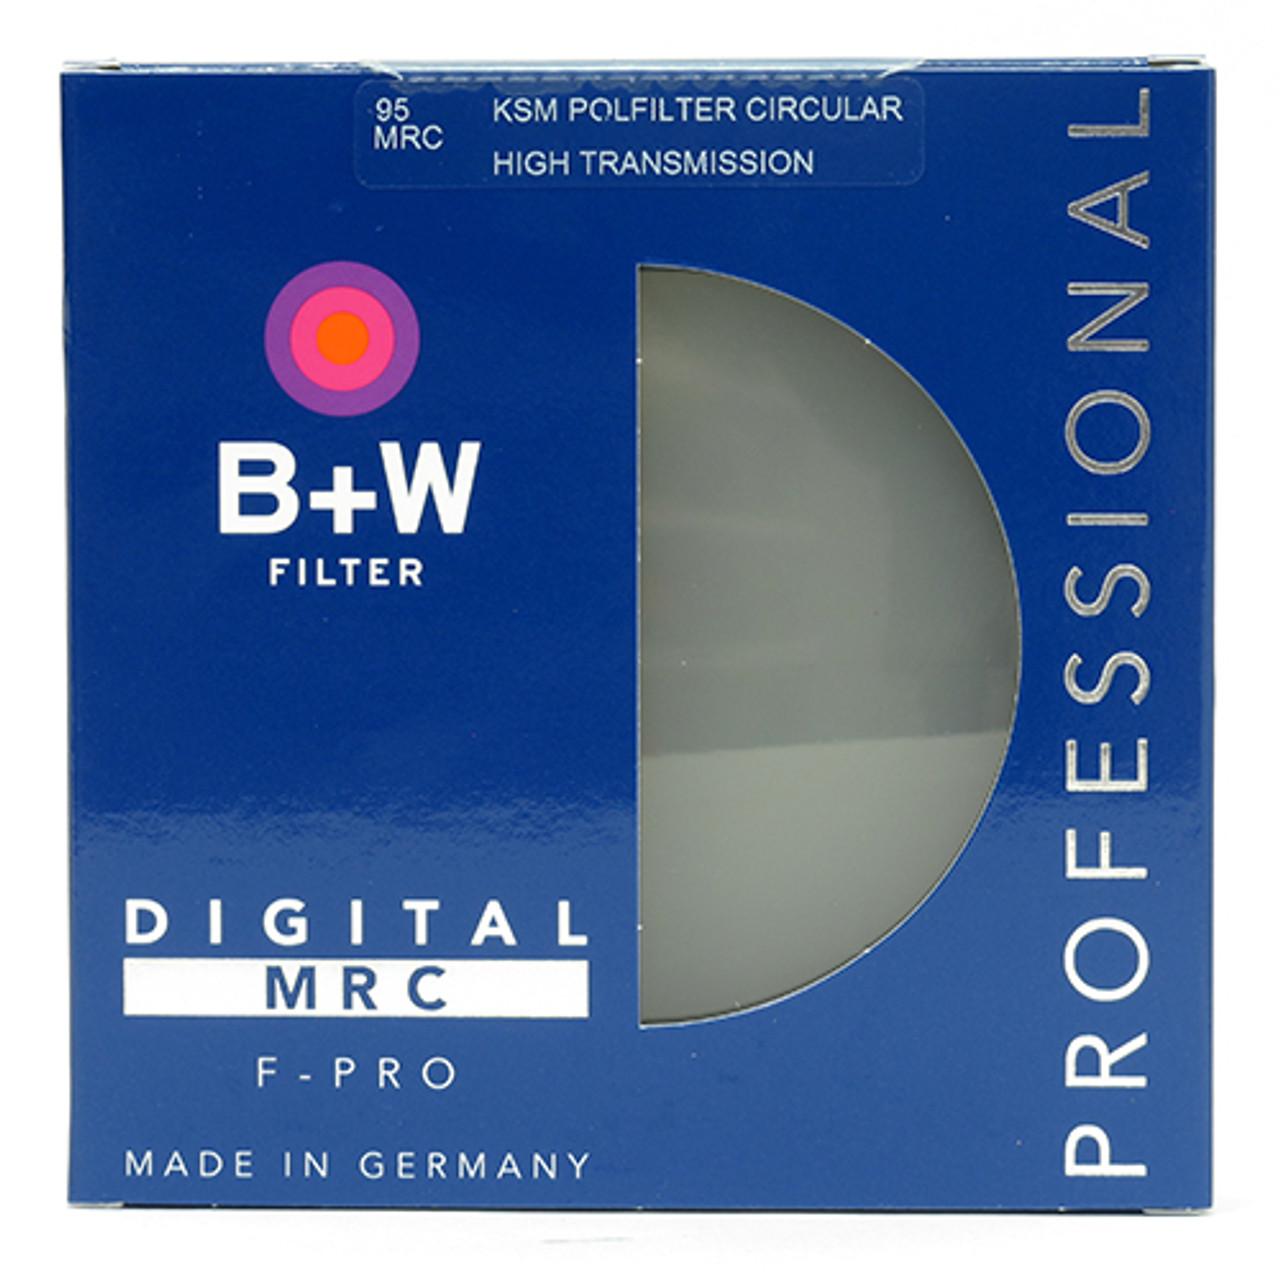 B+W KAESEMANN CIRCULAR POLARIZER HTC (95MM)